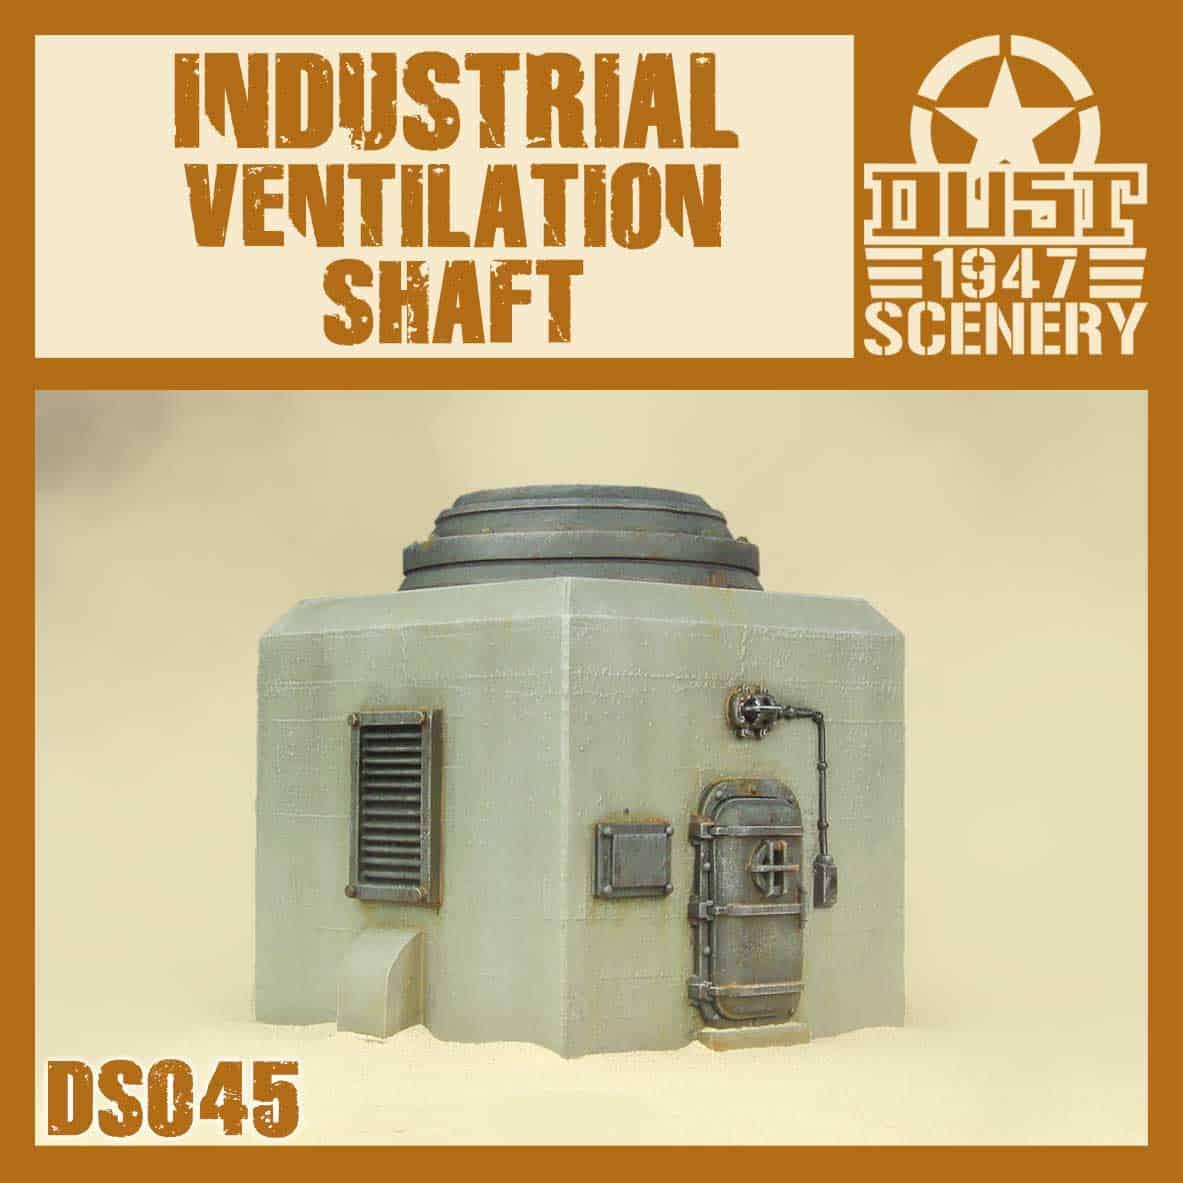 Zdjęcie Ventilation Shaft